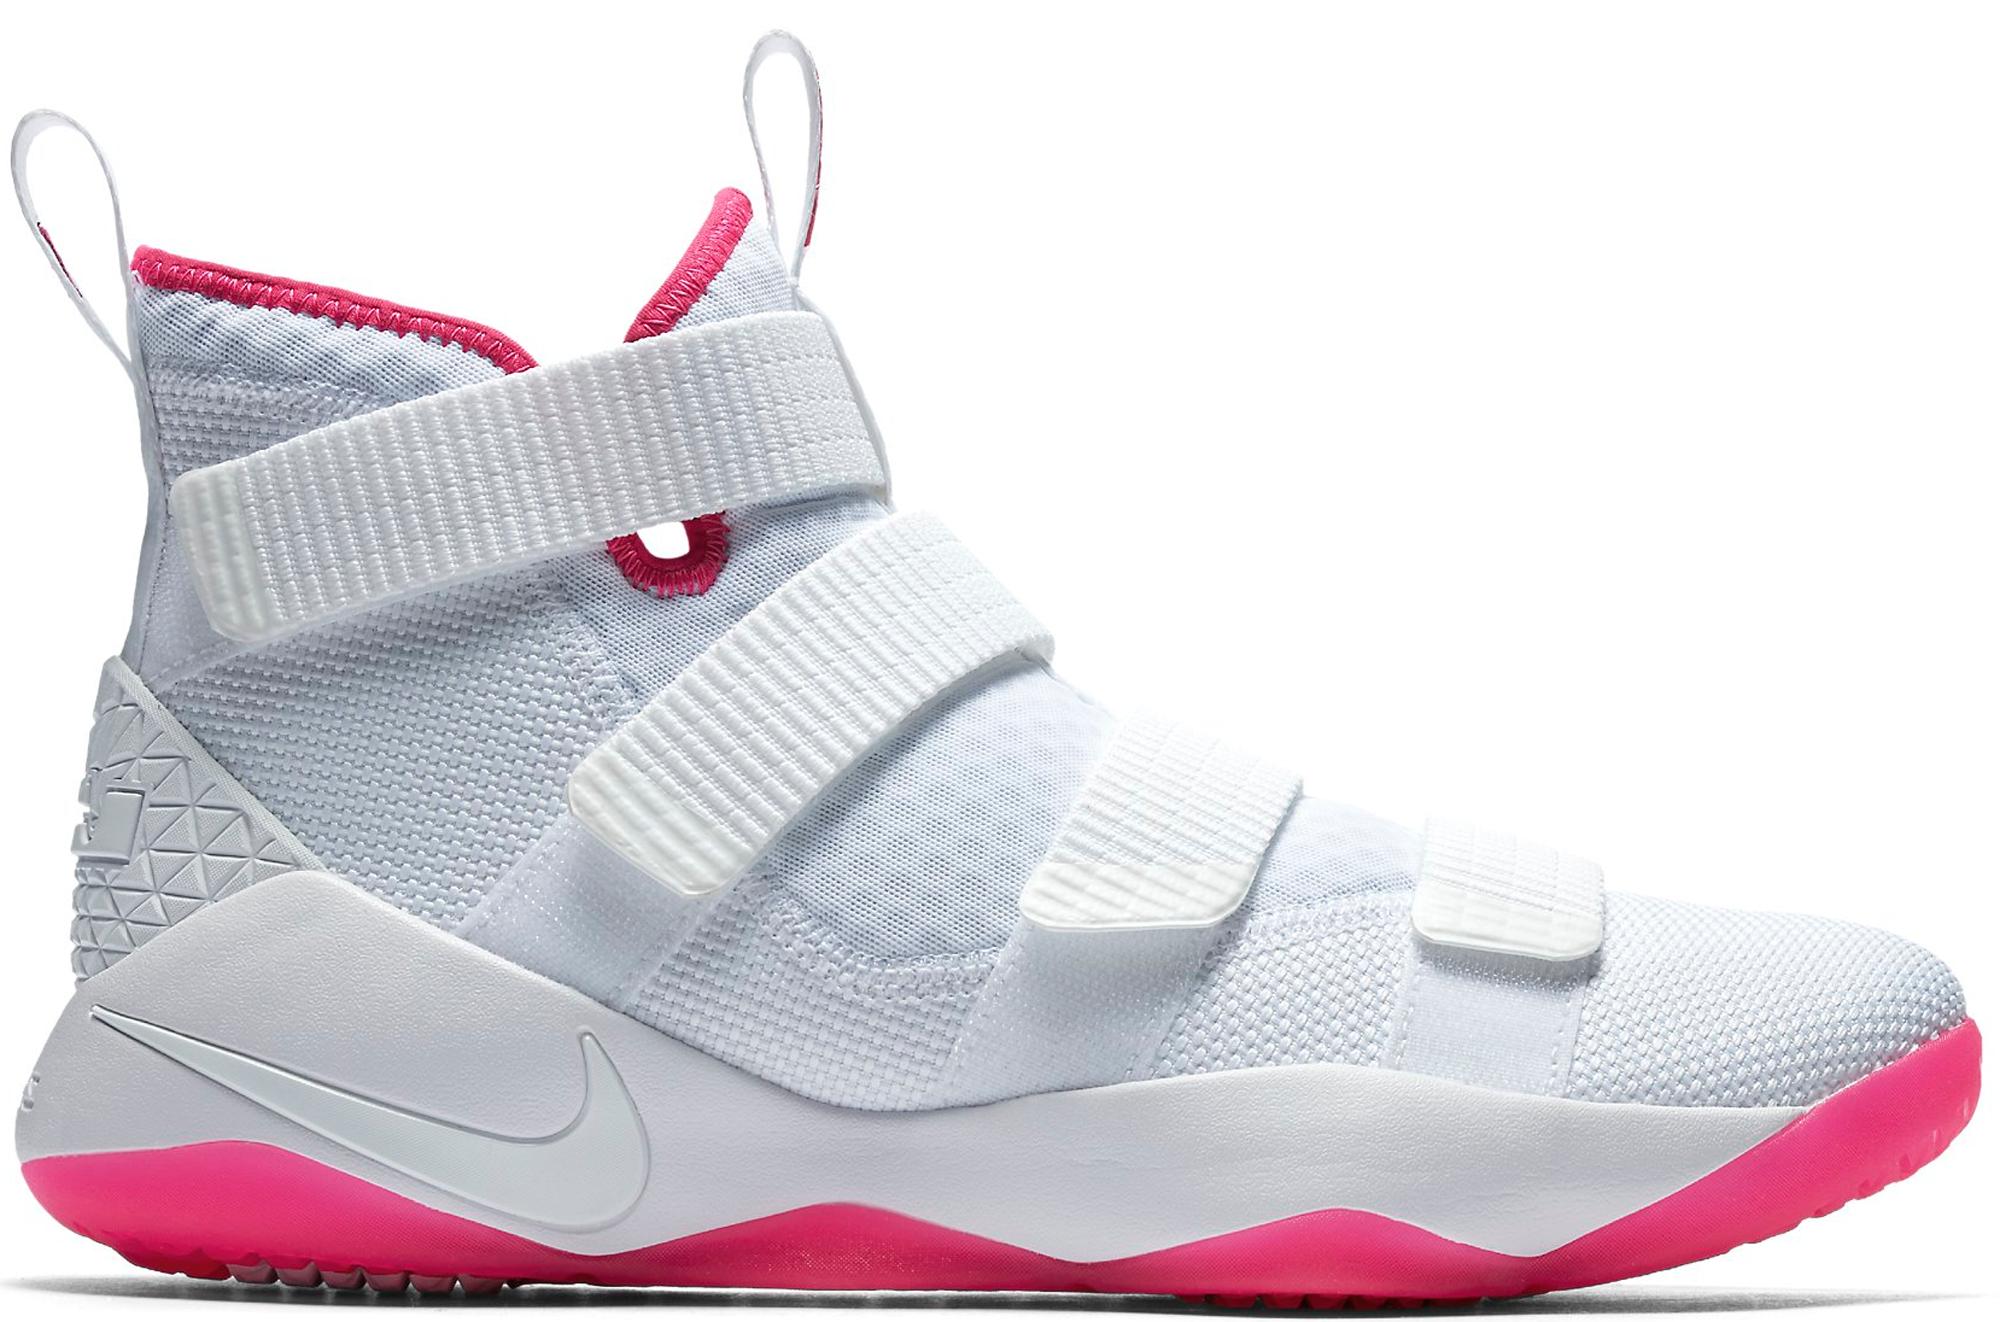 Nike LeBron Soldier 11 Kay Yow - 897644-102